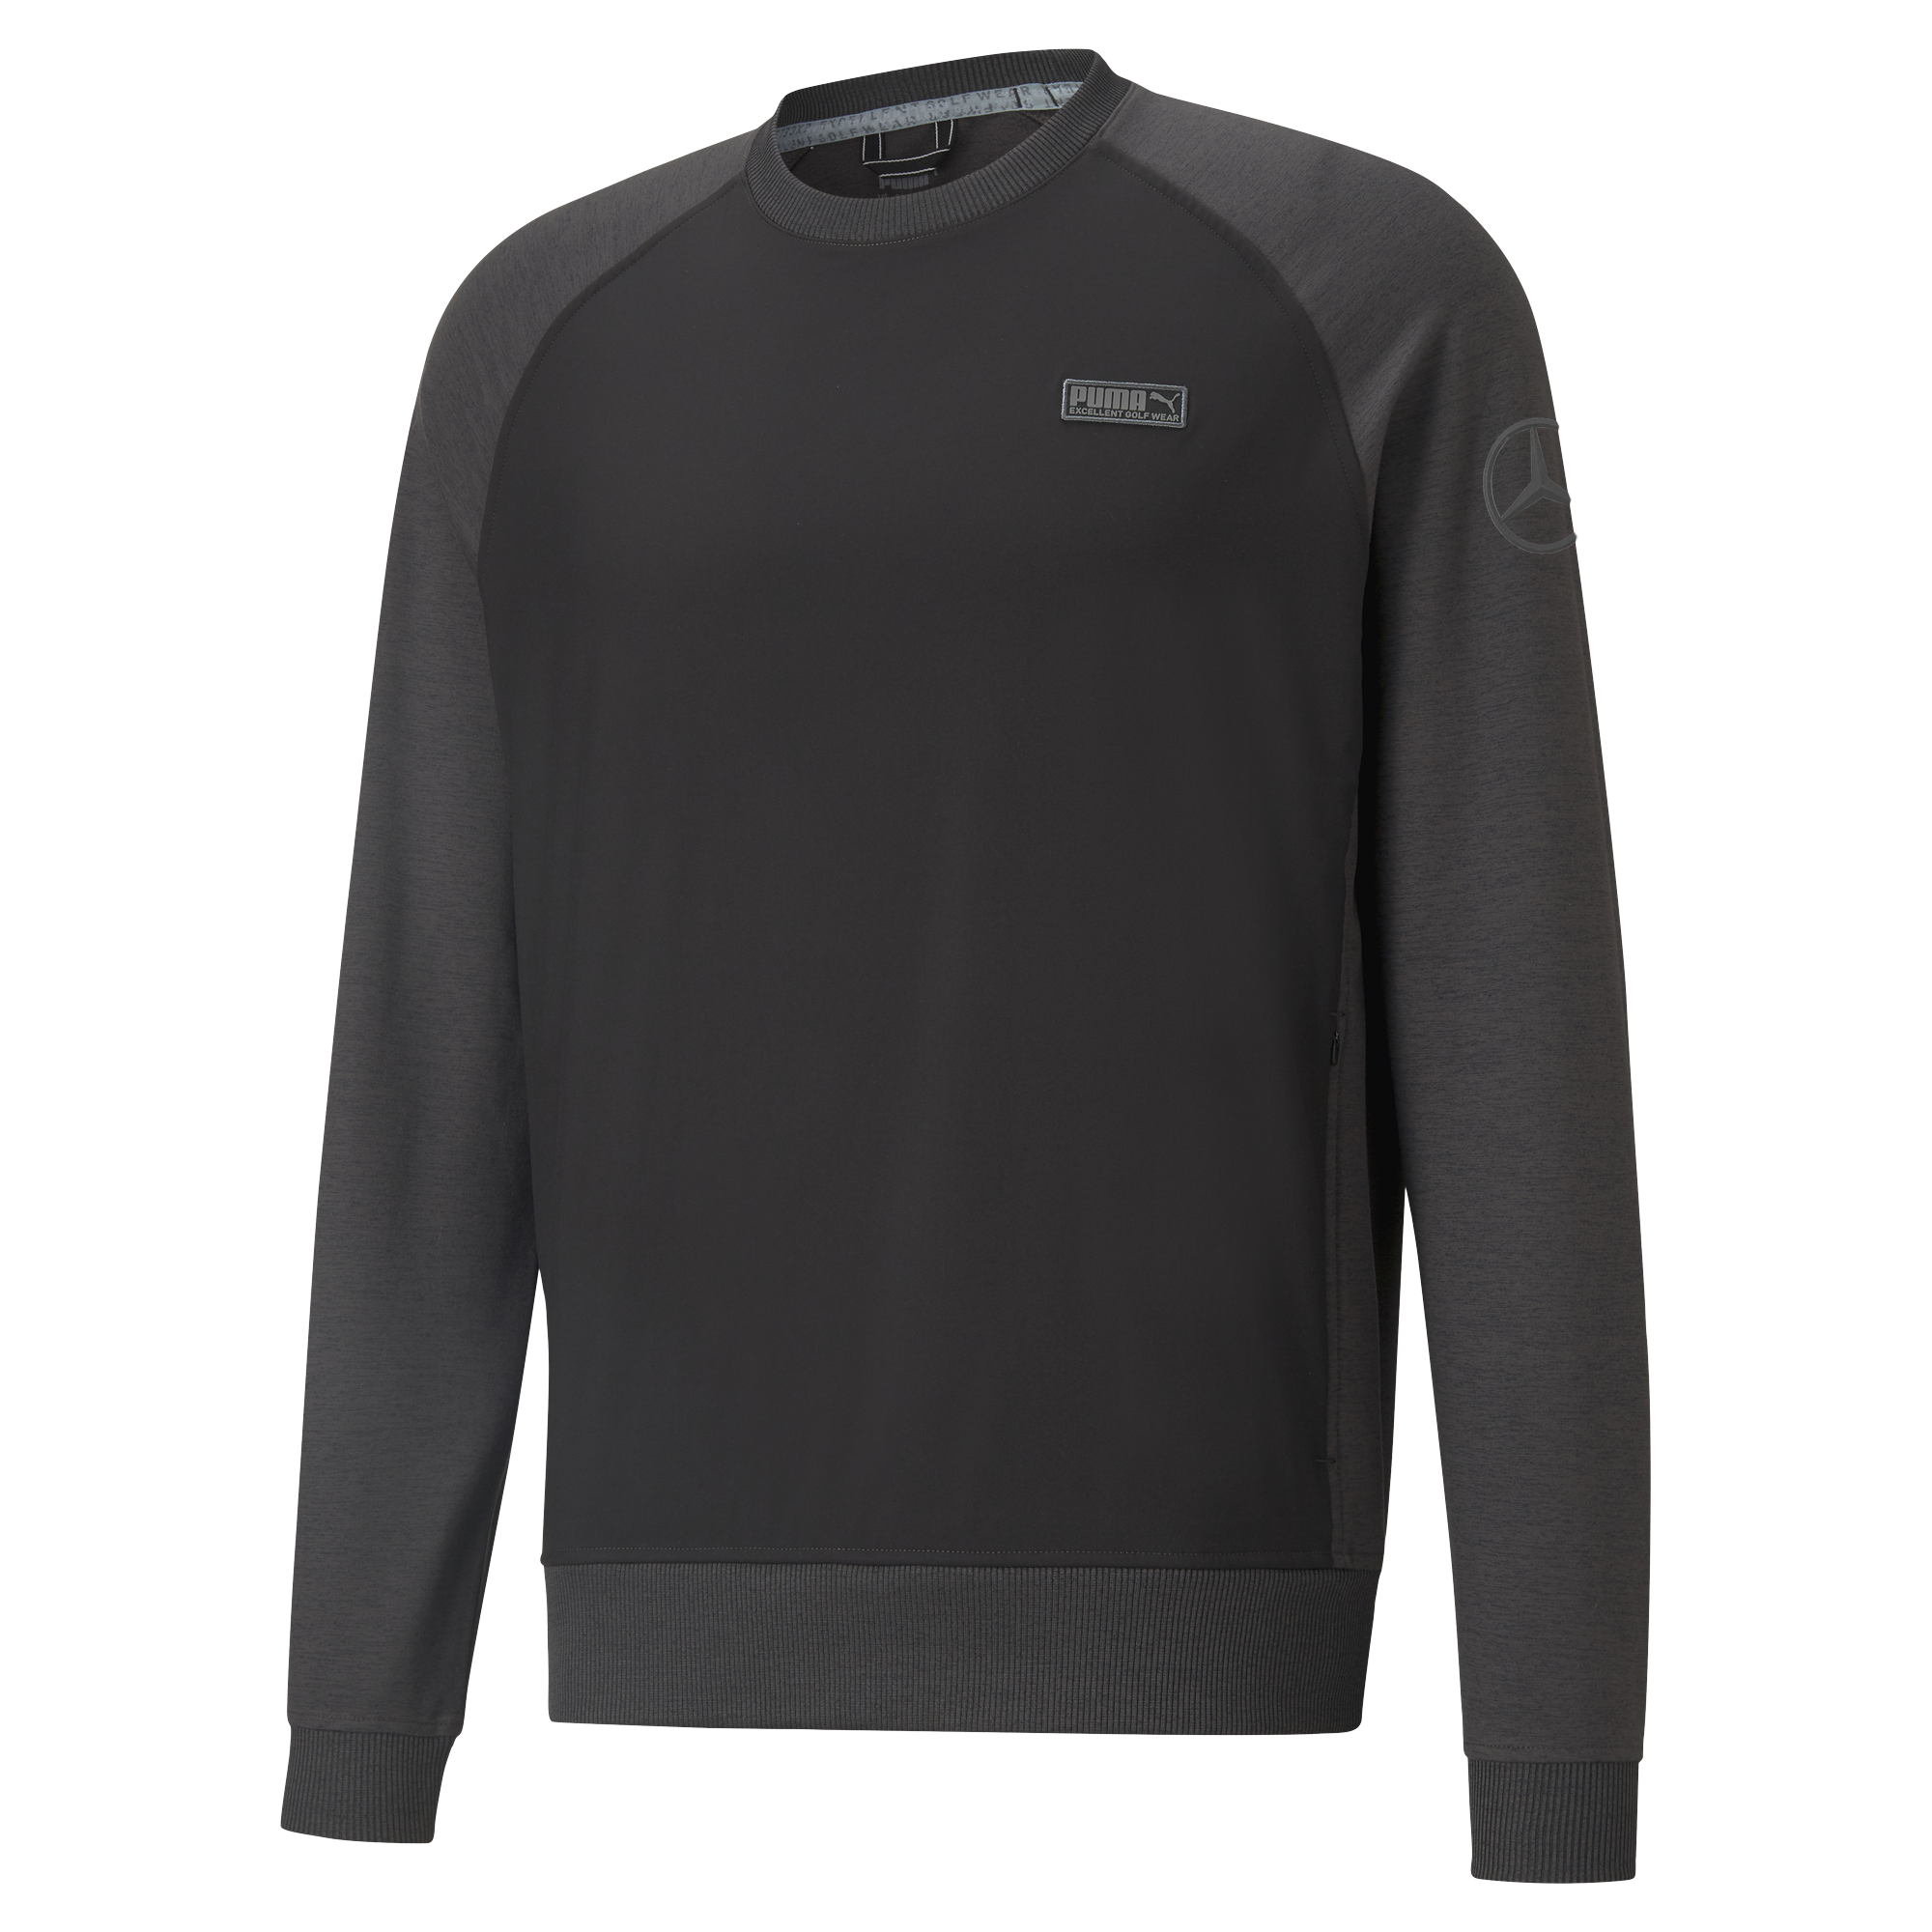 Herensweater golf